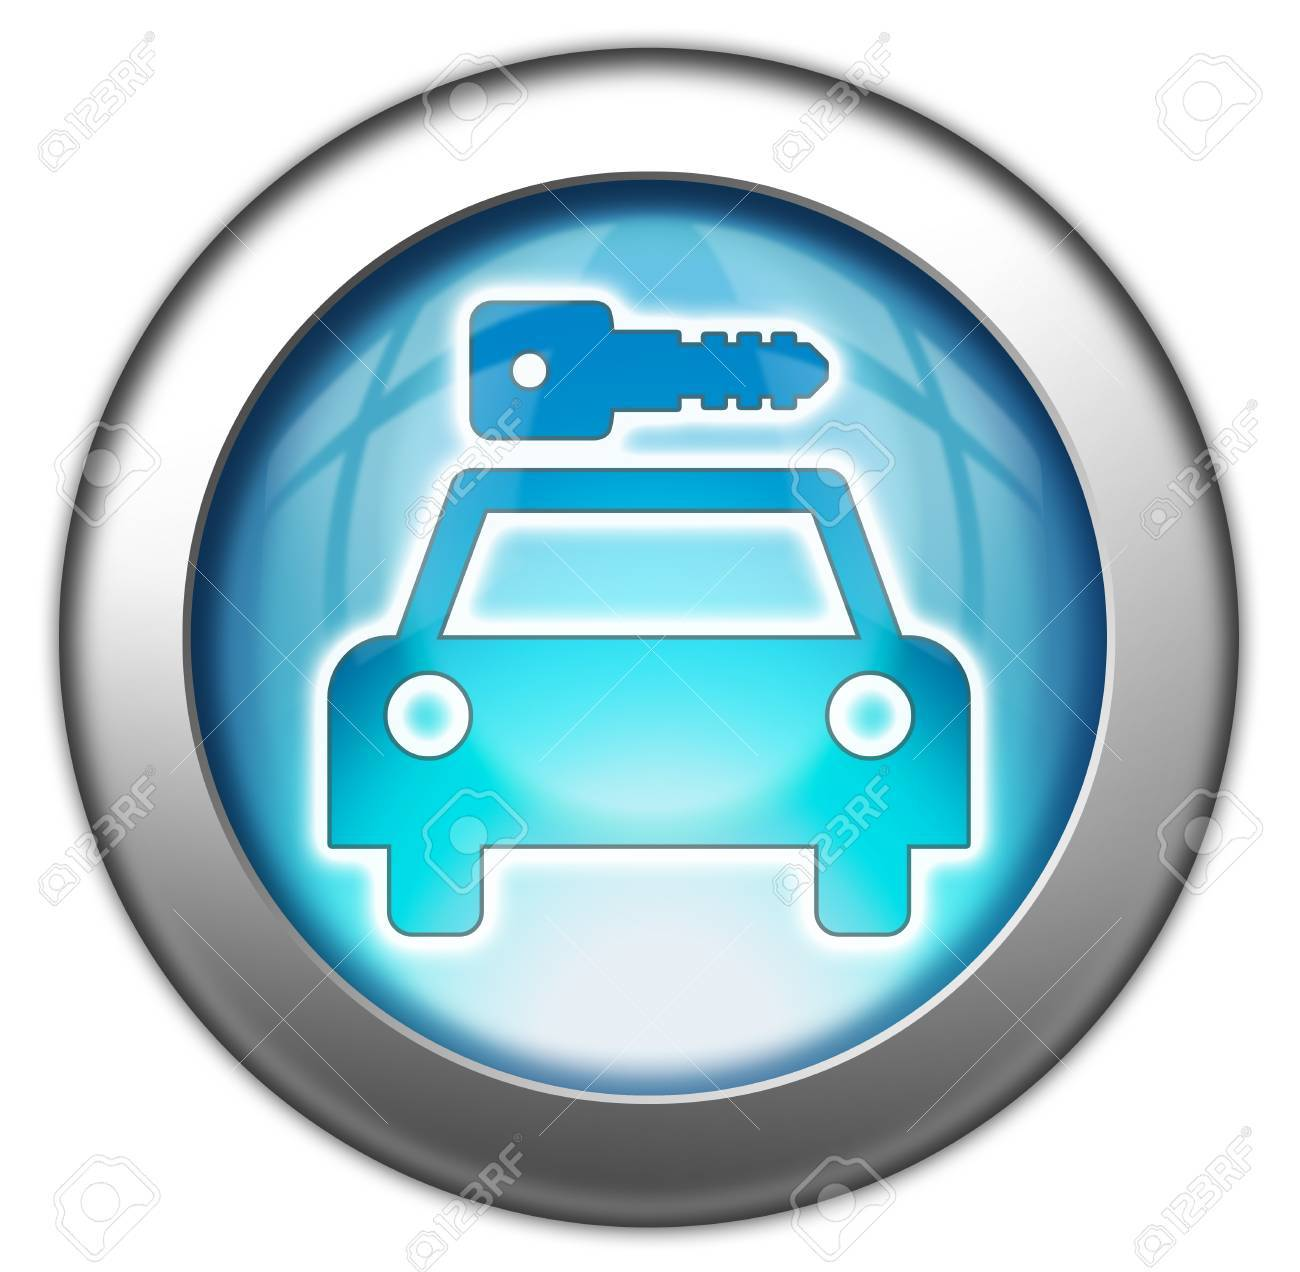 Icon, Button, Pictogram with Car Rental symbol Stock Photo - 27201101